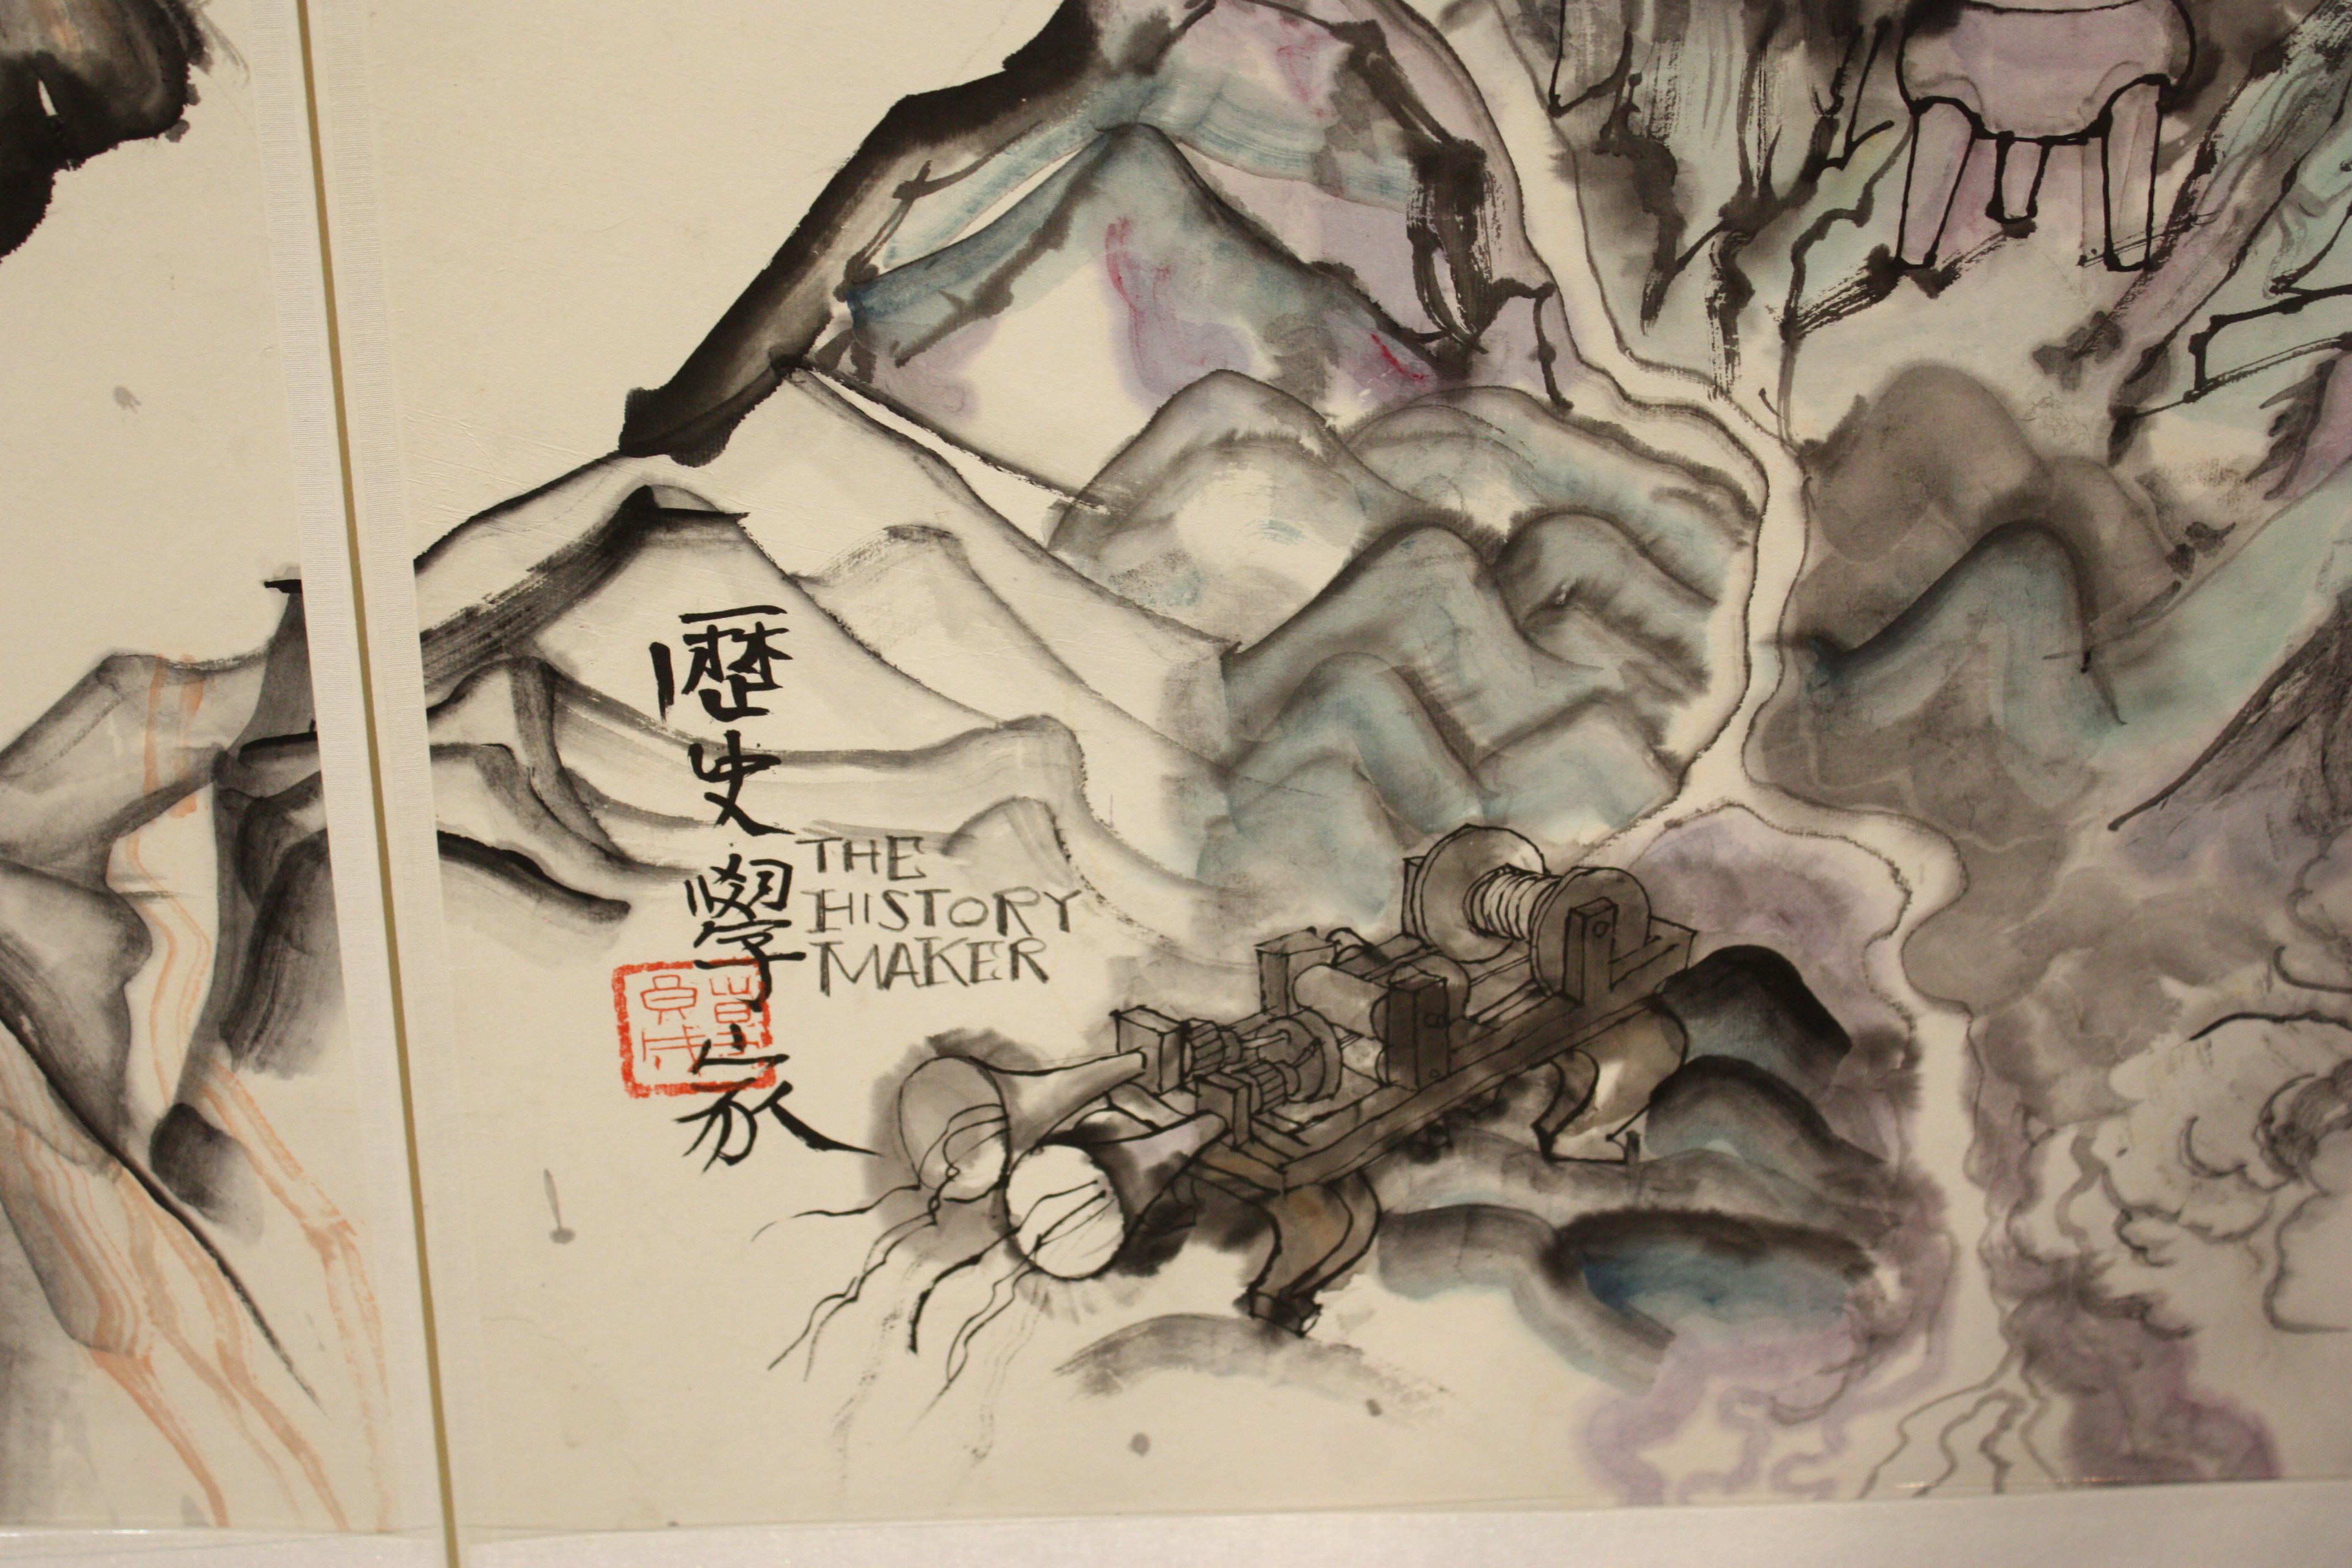 Qiu Zhijie Geschiedenis machine